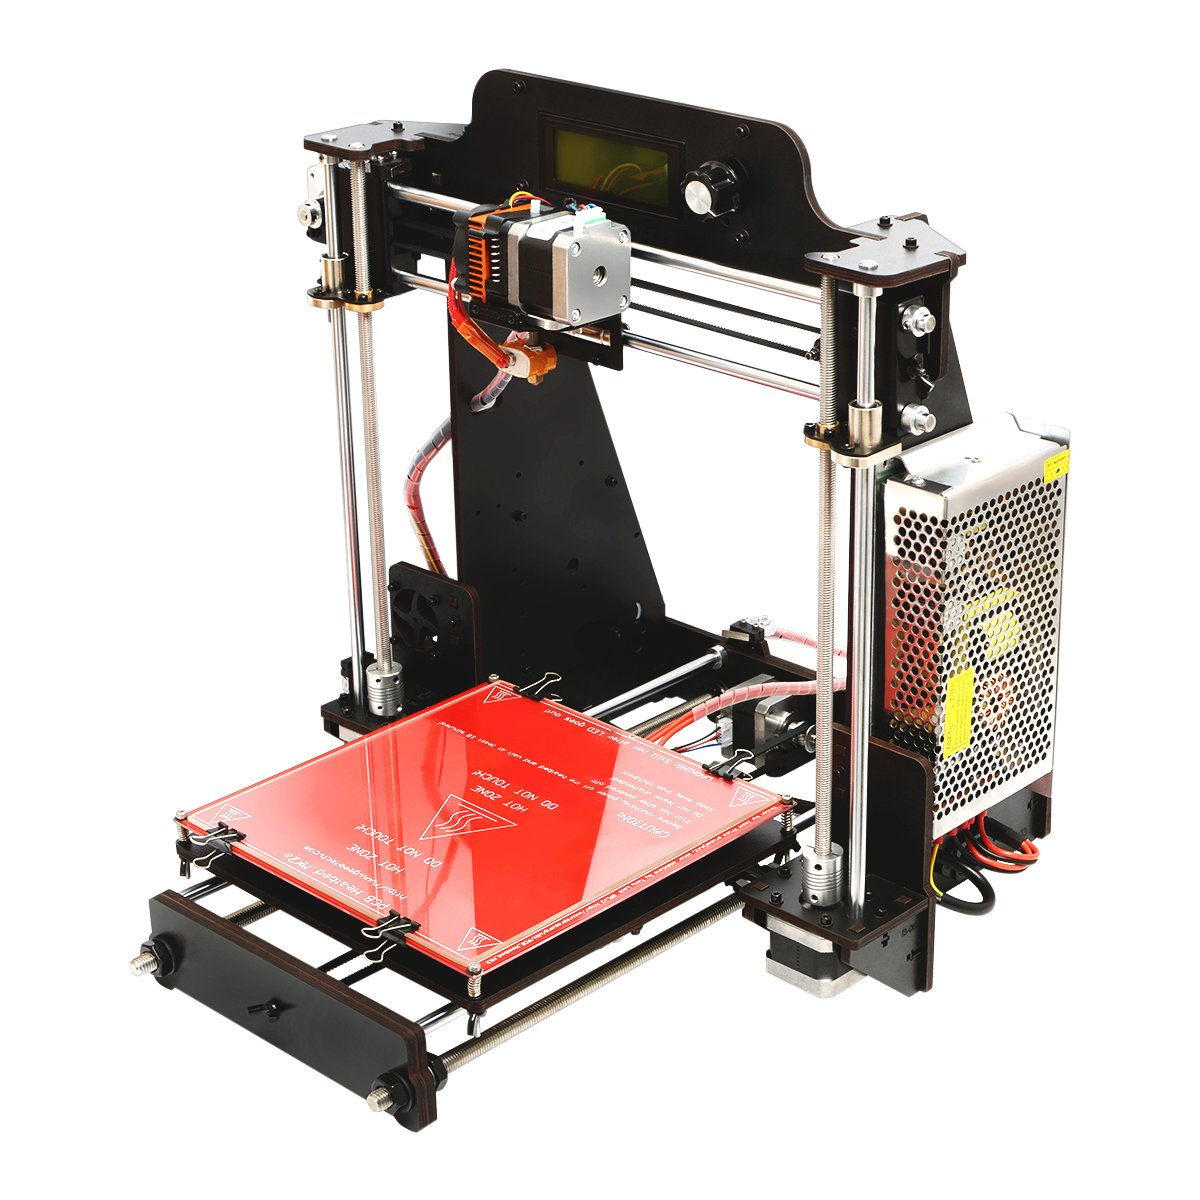 Geeetech® Prusa I3 Pro W DIY 3D Printer 200x200x180mm Printing Size 1.75mm 0.3mm Nozzle